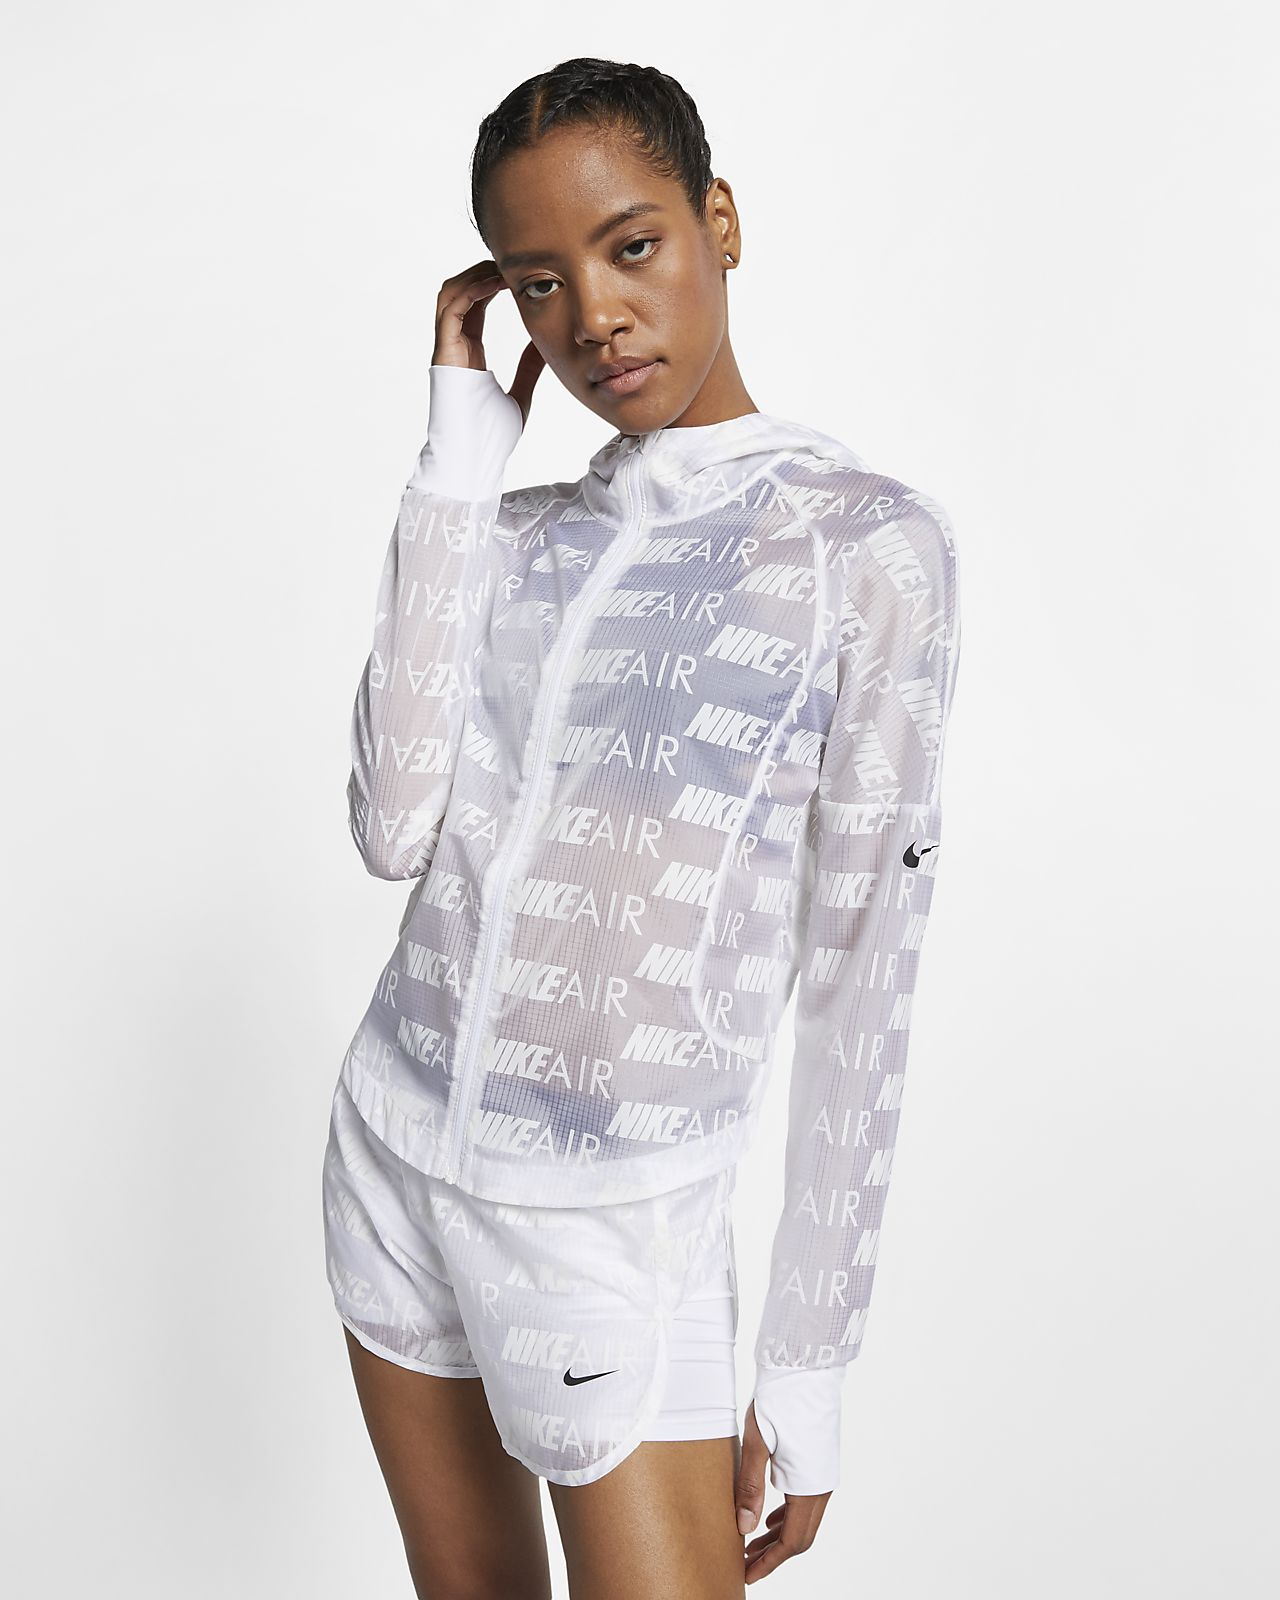 Capuchees Avec Femme Nike G7bf6y Running Veste Air À PuOkXZiT